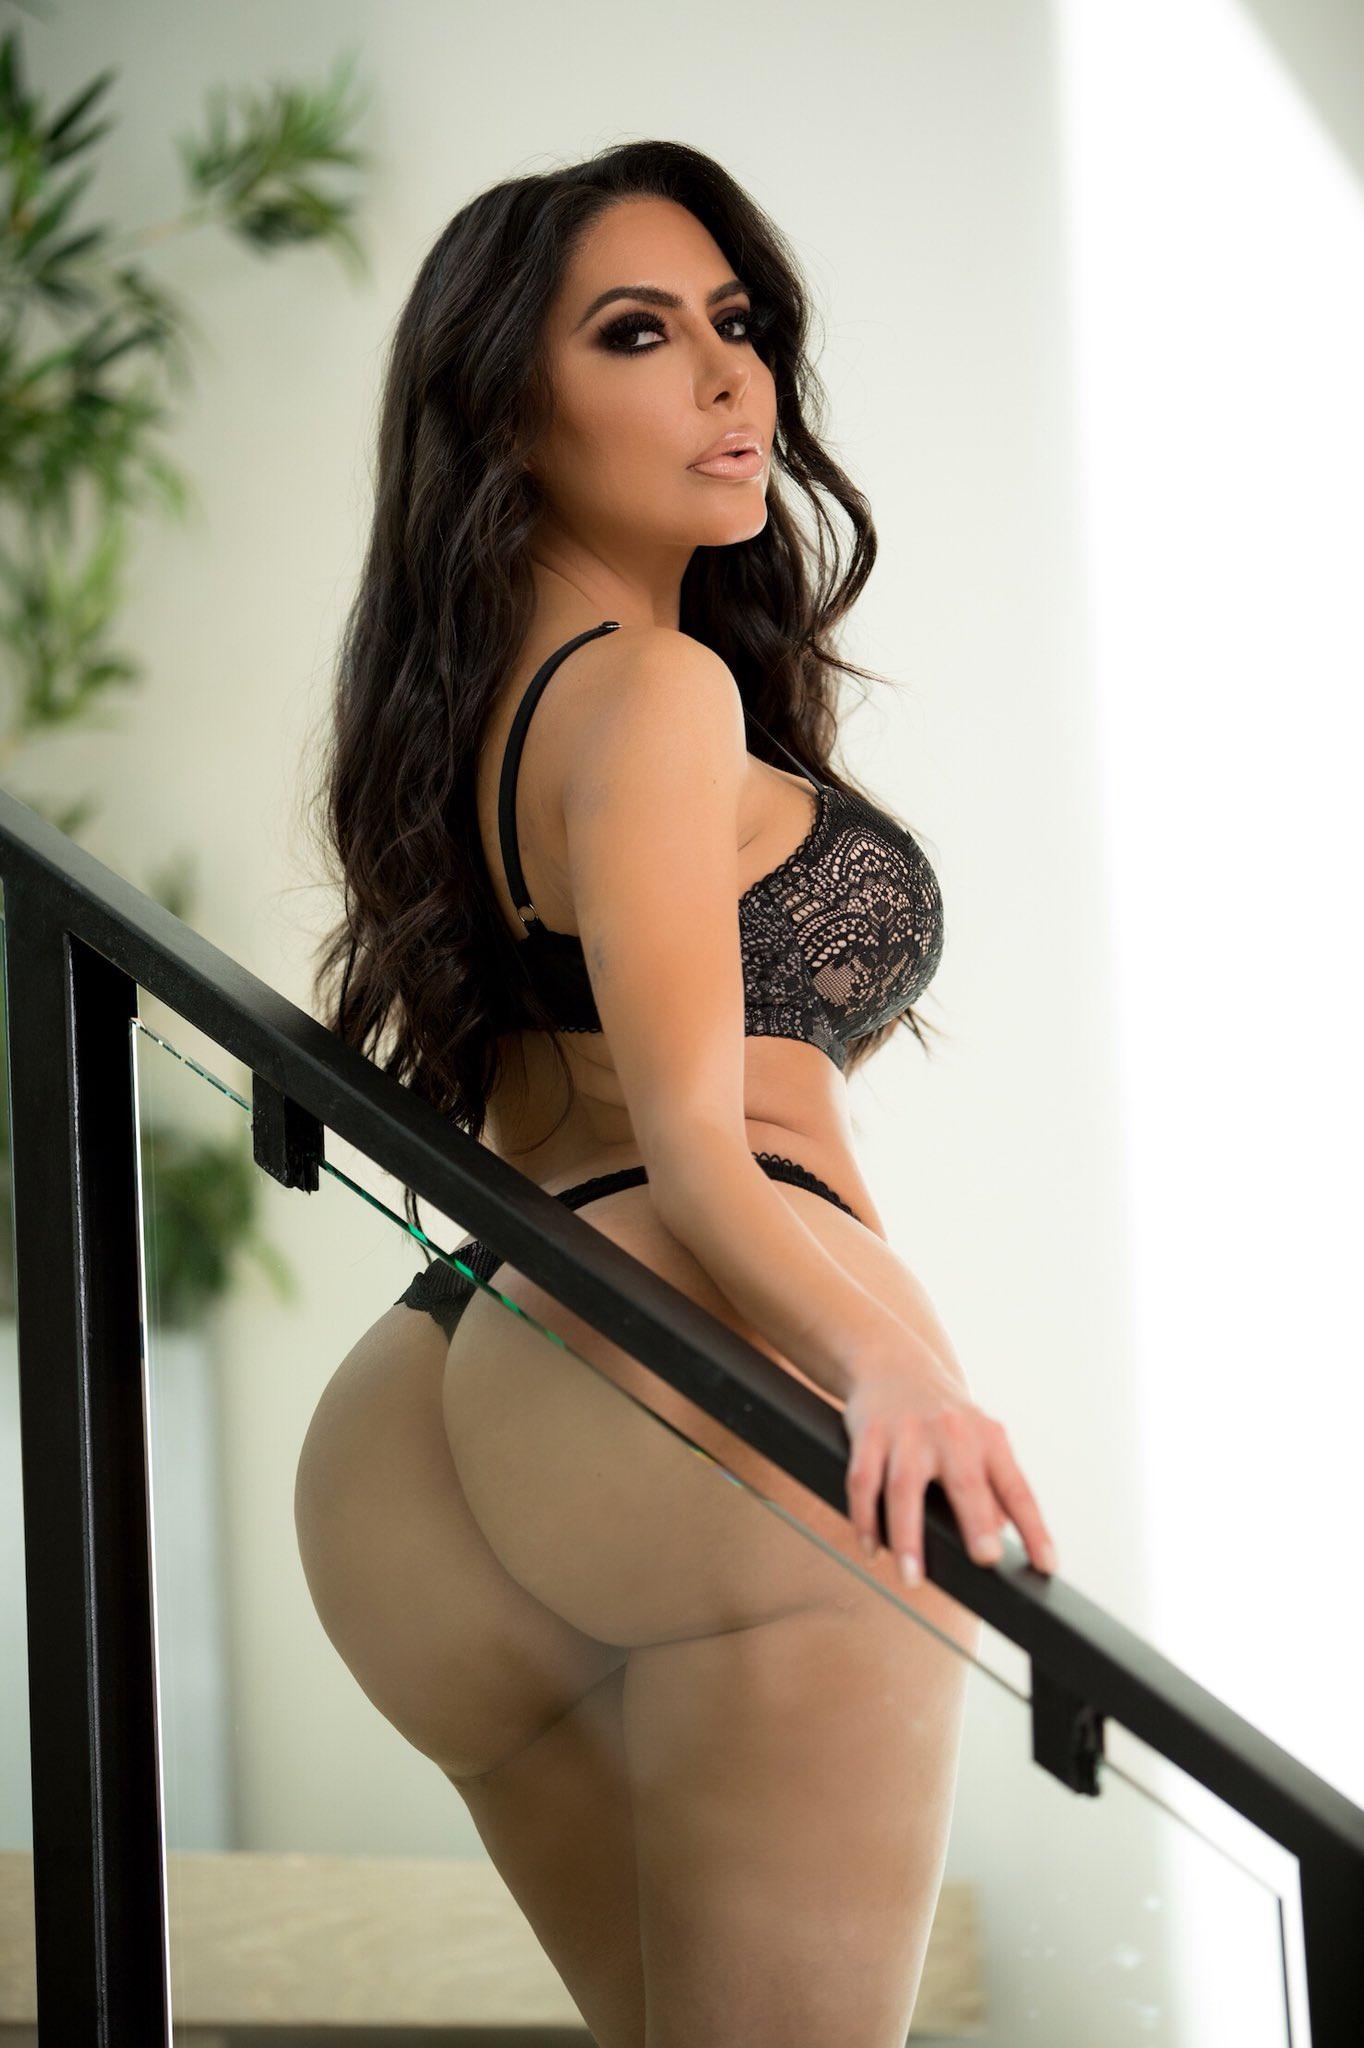 Latina goddess naked-porn pic